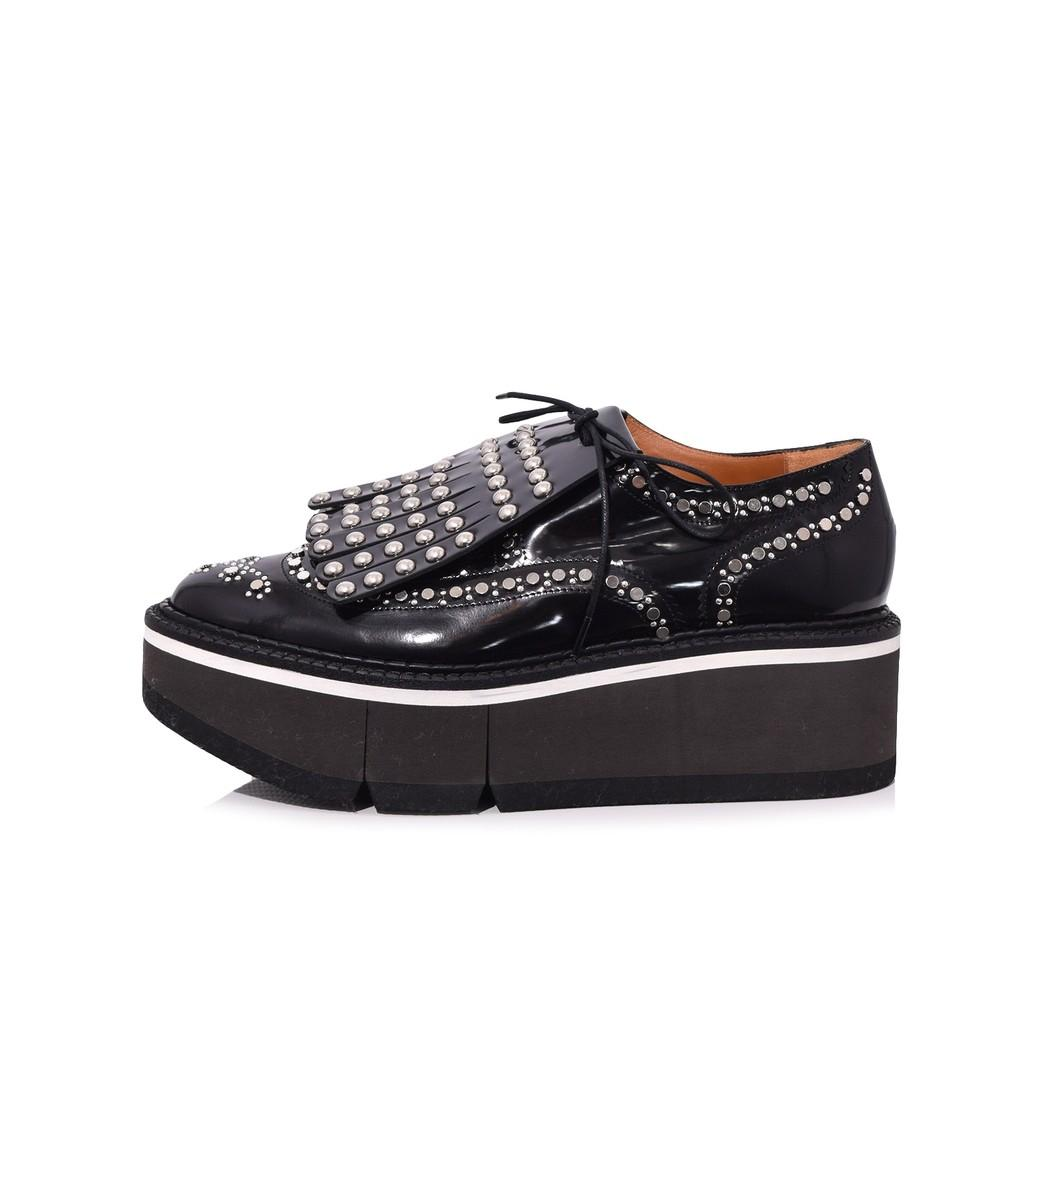 31e93c705fcf Clergerie Black Boelou Oxford. ShopBAZAAR